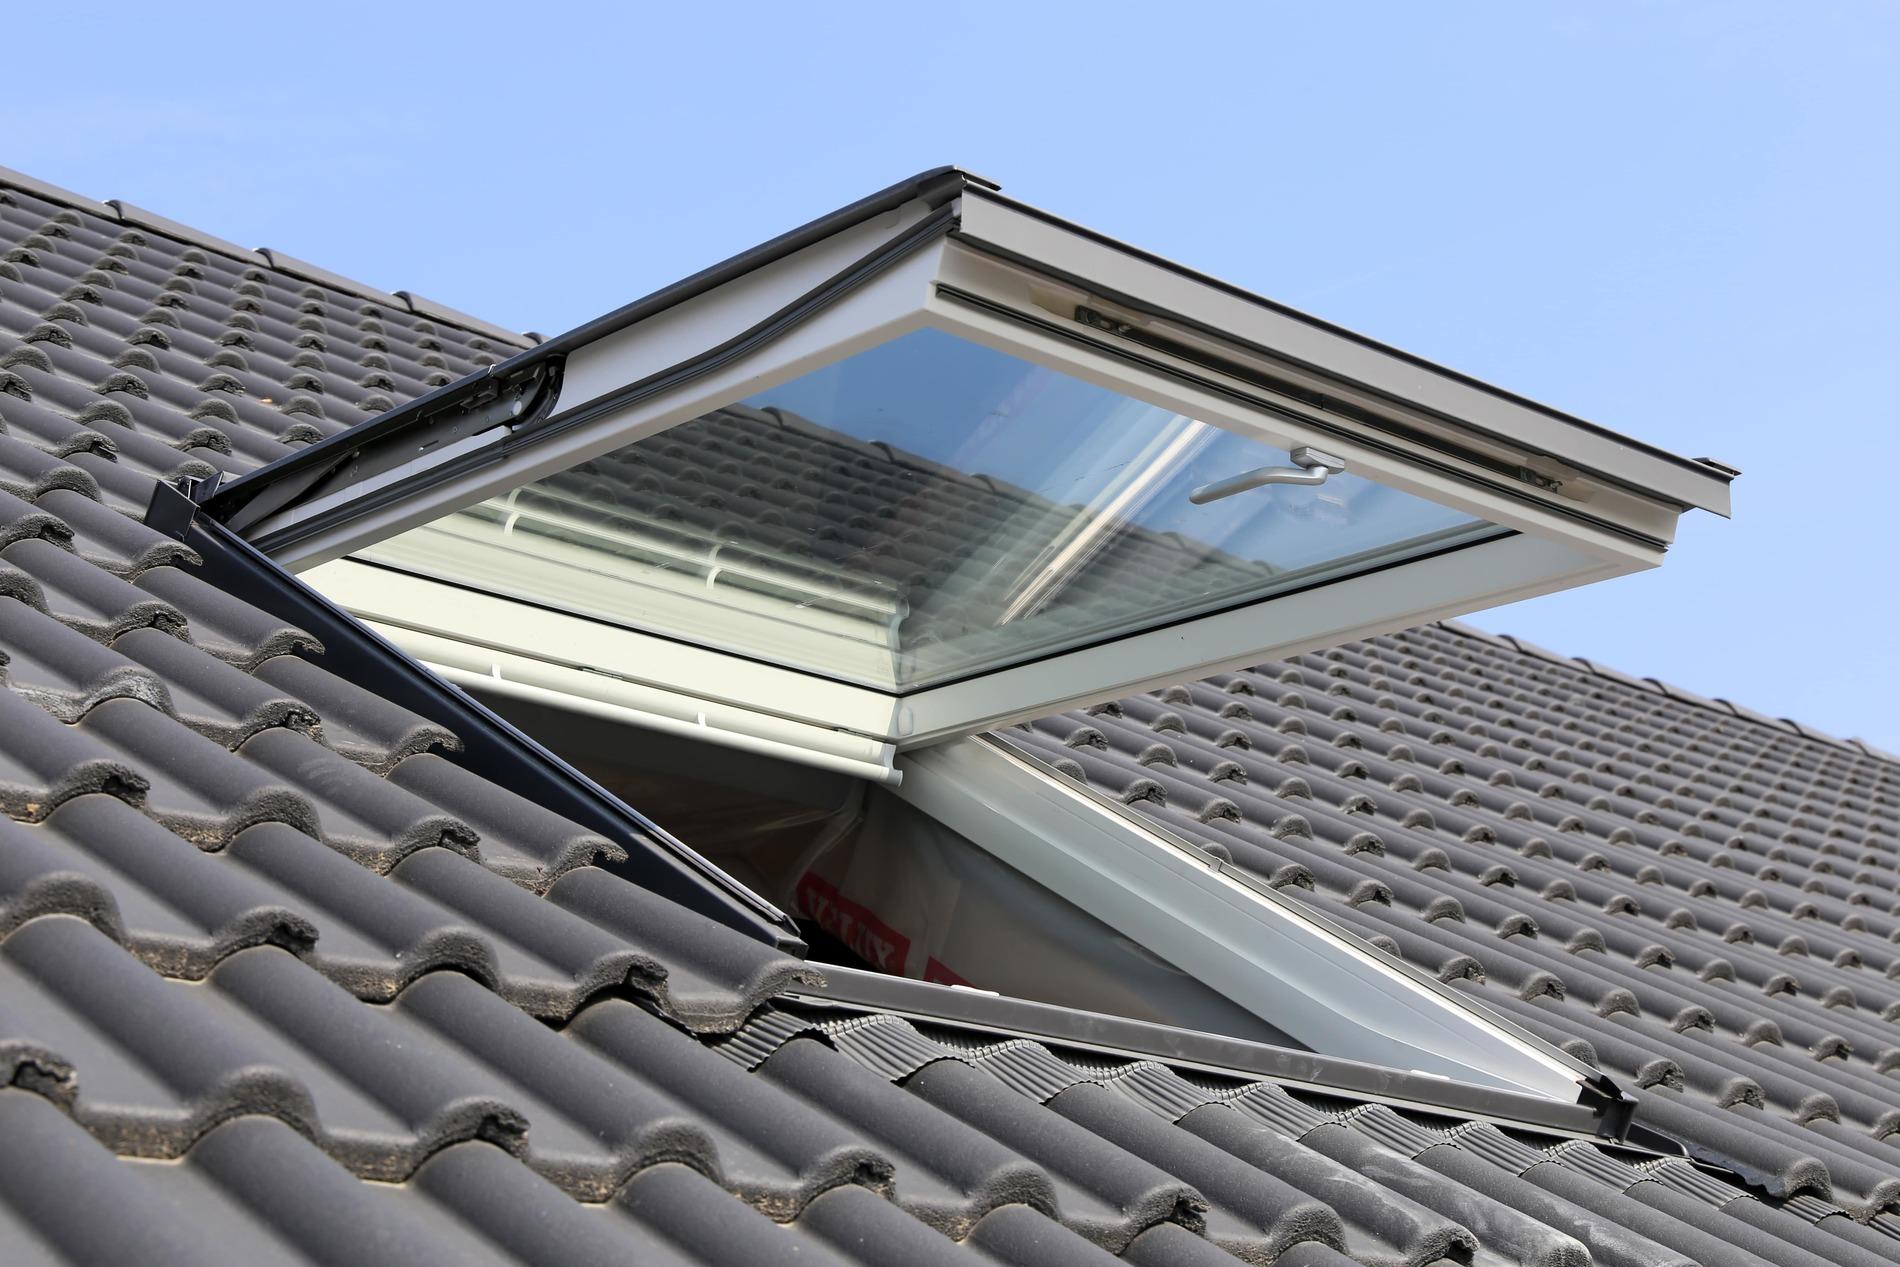 Fensterarbeiten in Itzehoe und Umgebung